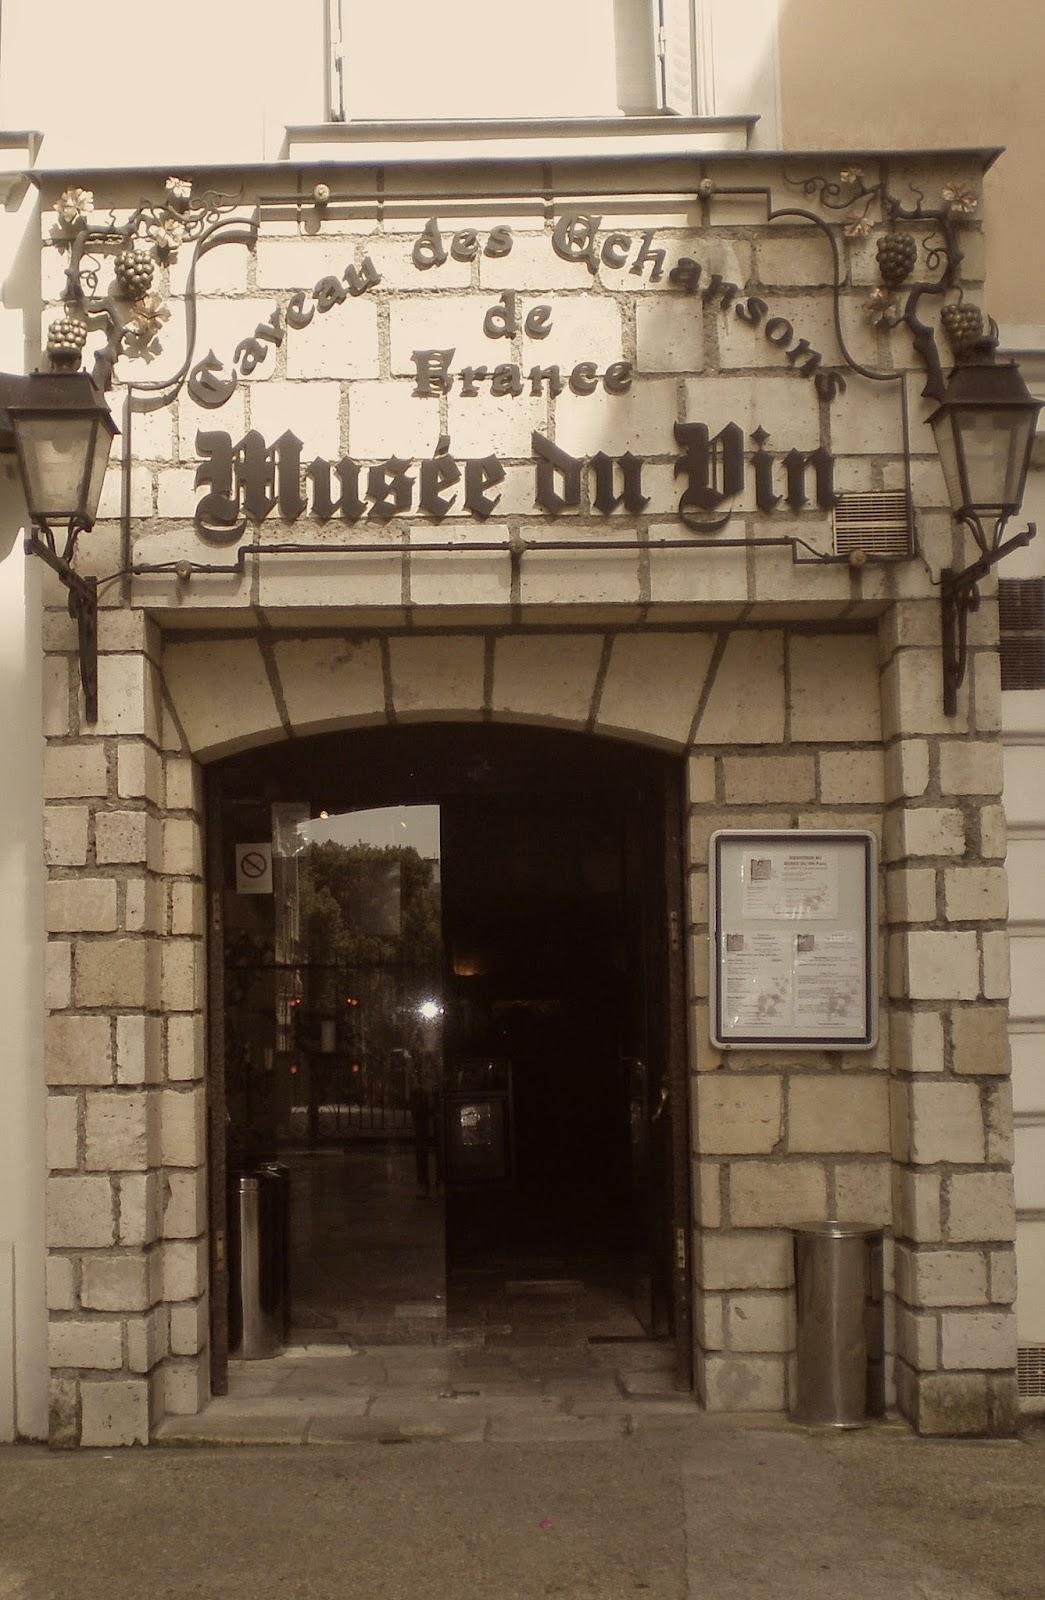 imágen de puerta de entrada al musée du vins paris